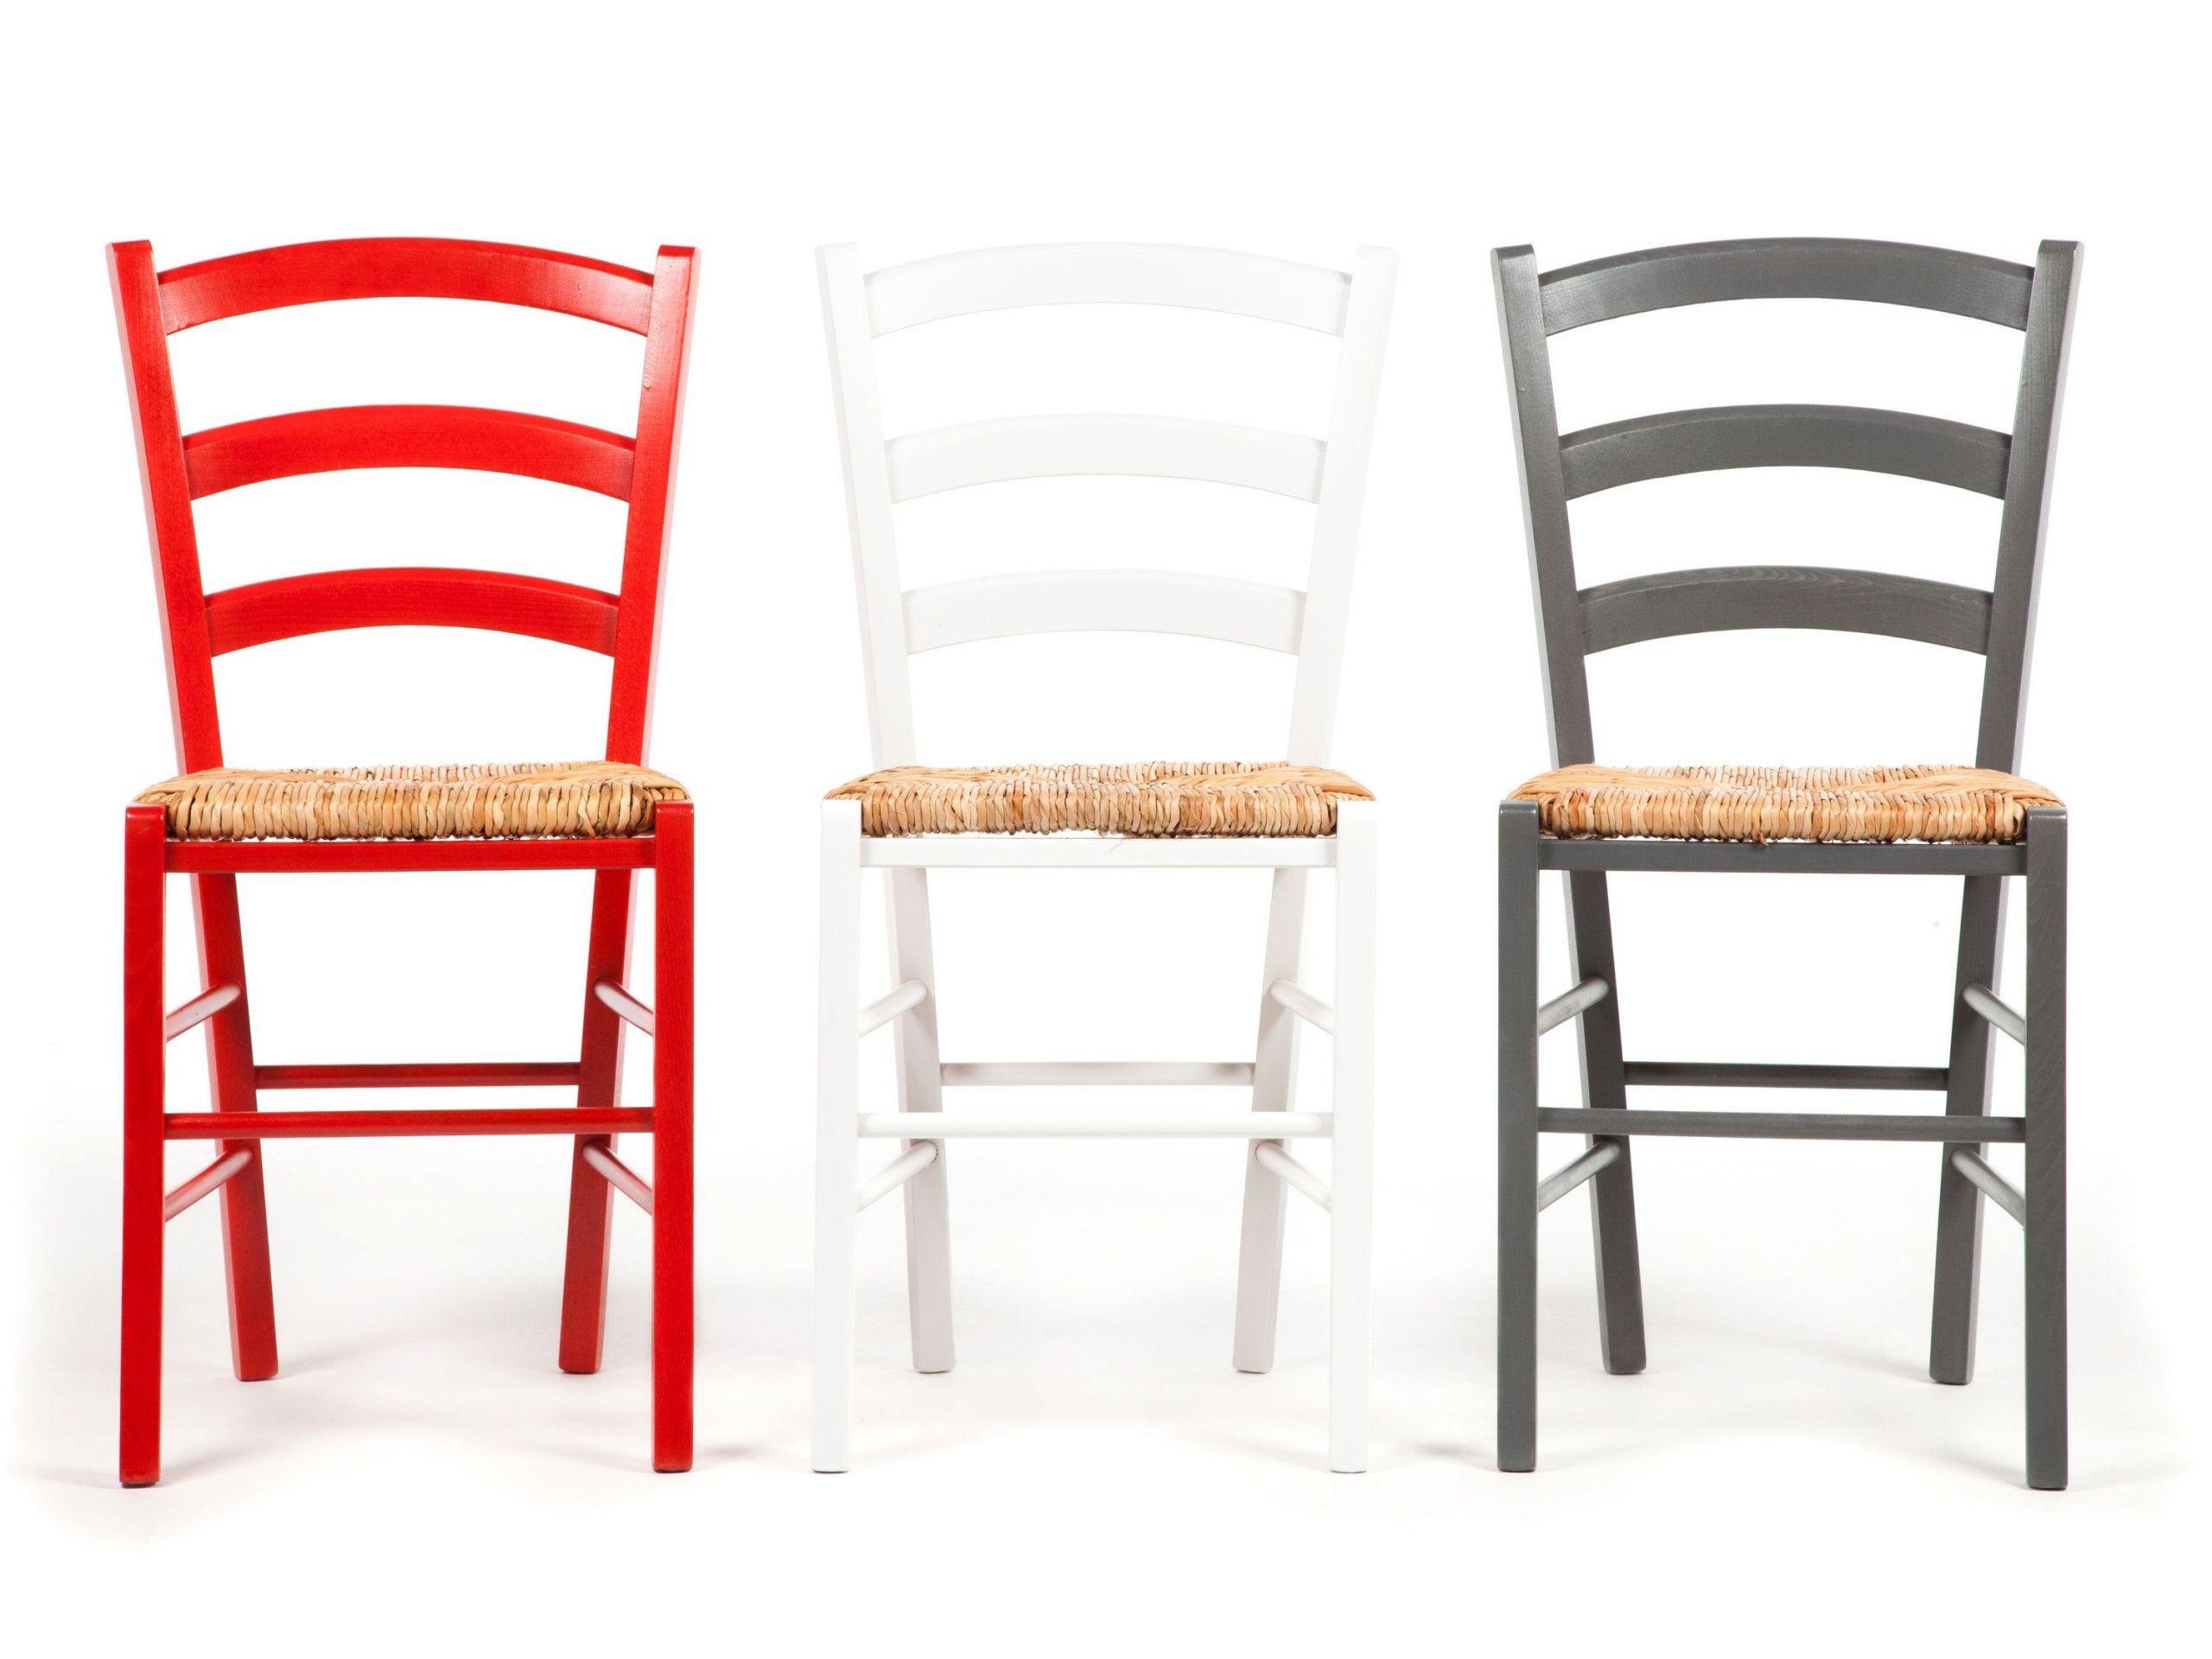 chaise resine tressee elegant epingle par lina sur chaises de chaise resine tressee scaled